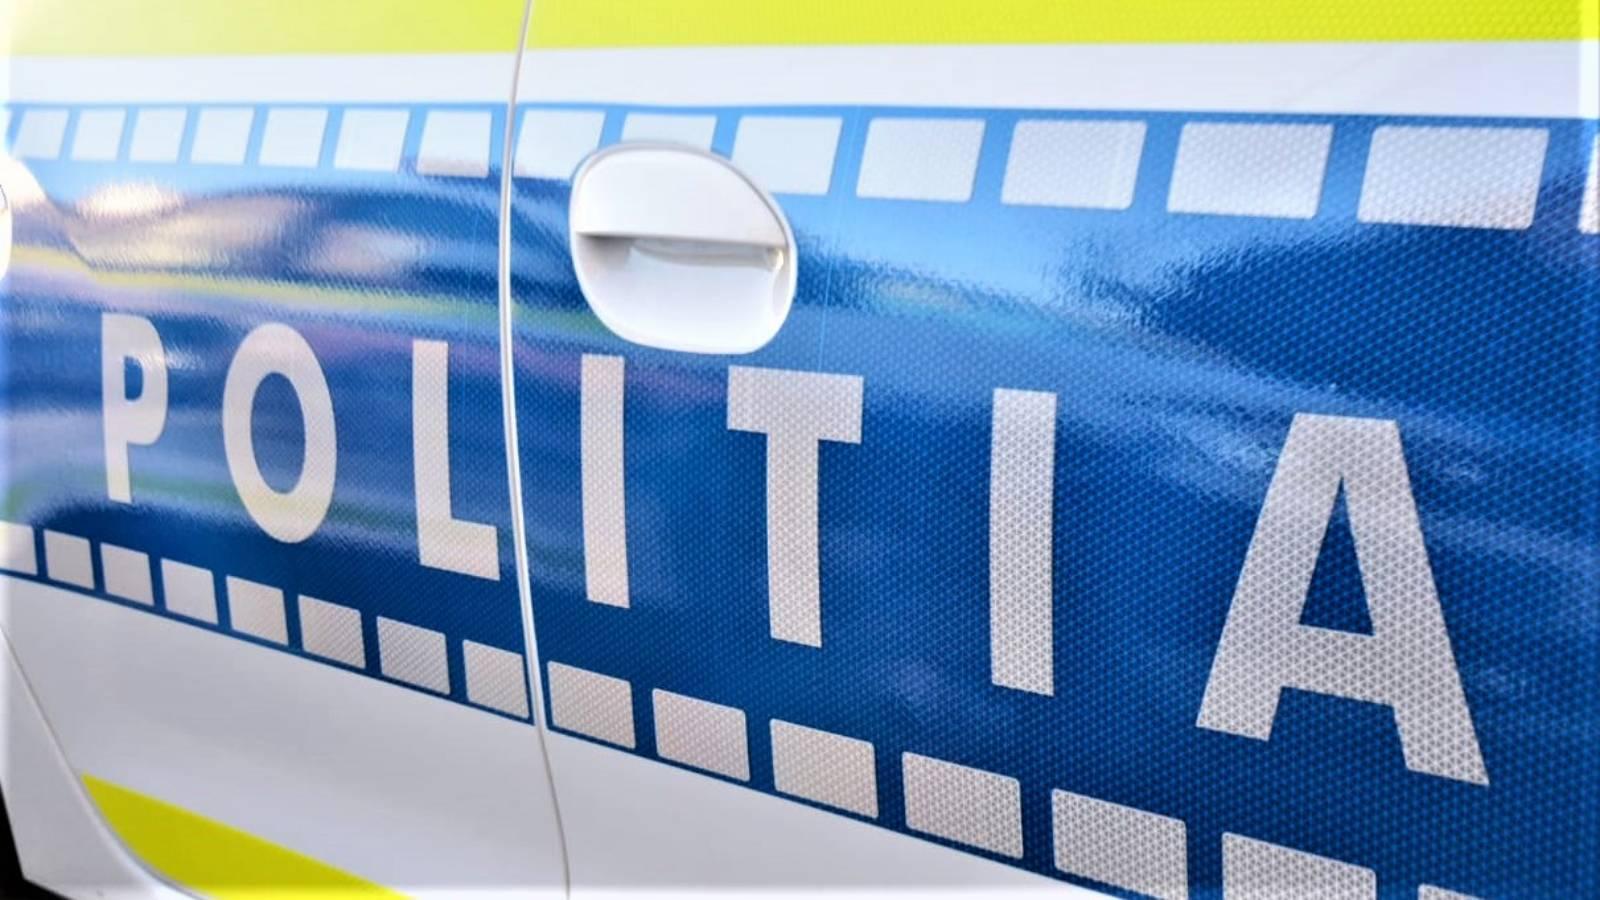 Politia Romana politiele RCA telefon